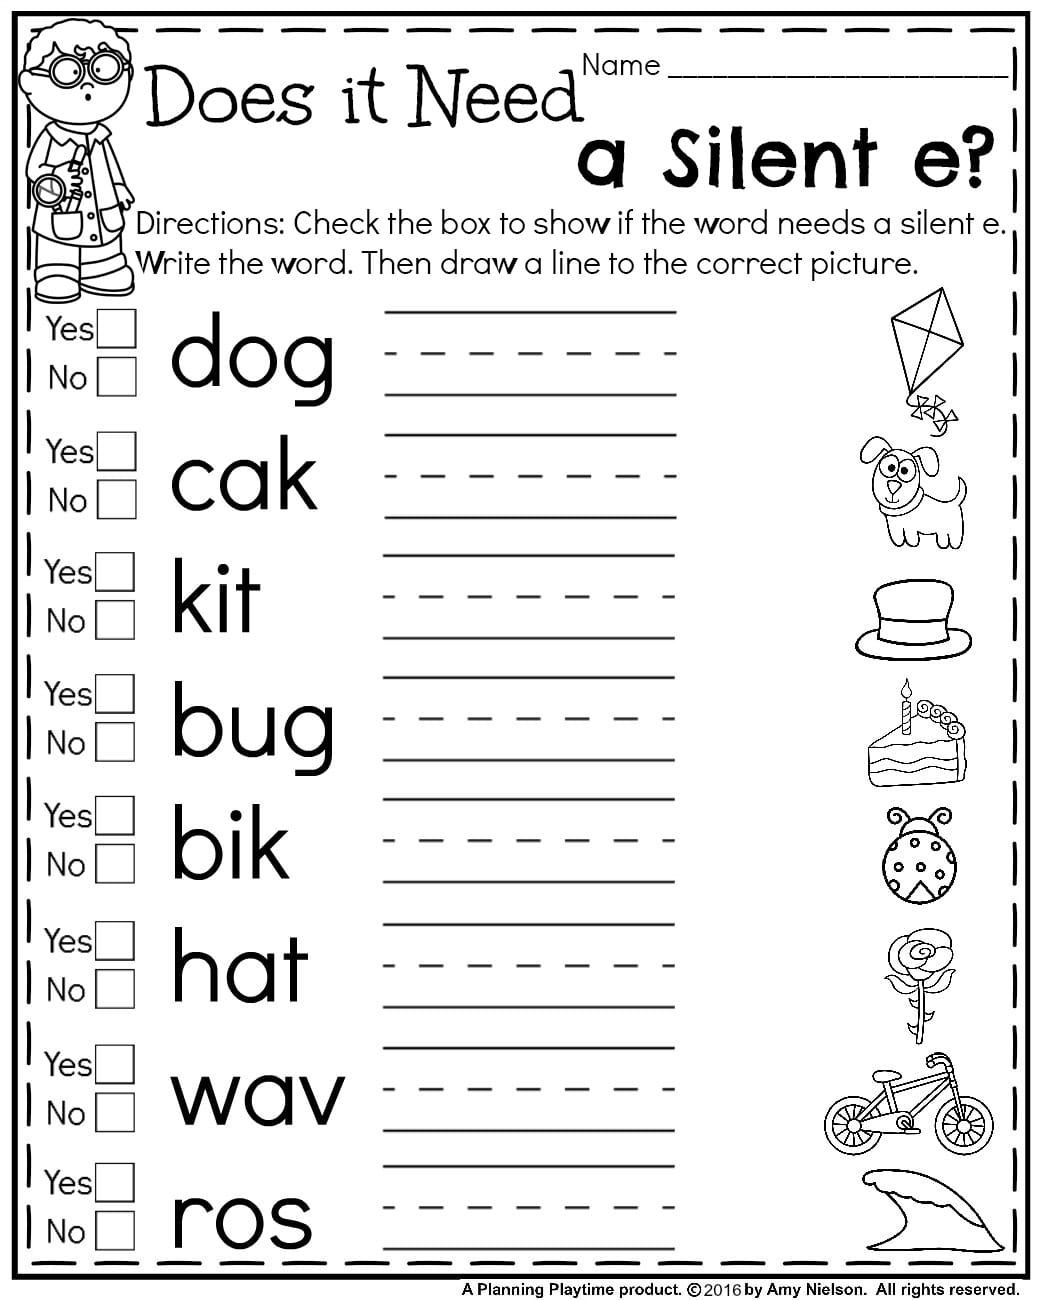 hight resolution of https://cute766.info/first-grade-silent-e-worksheets-for-summer-1st-grade-worksheets-2nd-grade-worksheets-first/